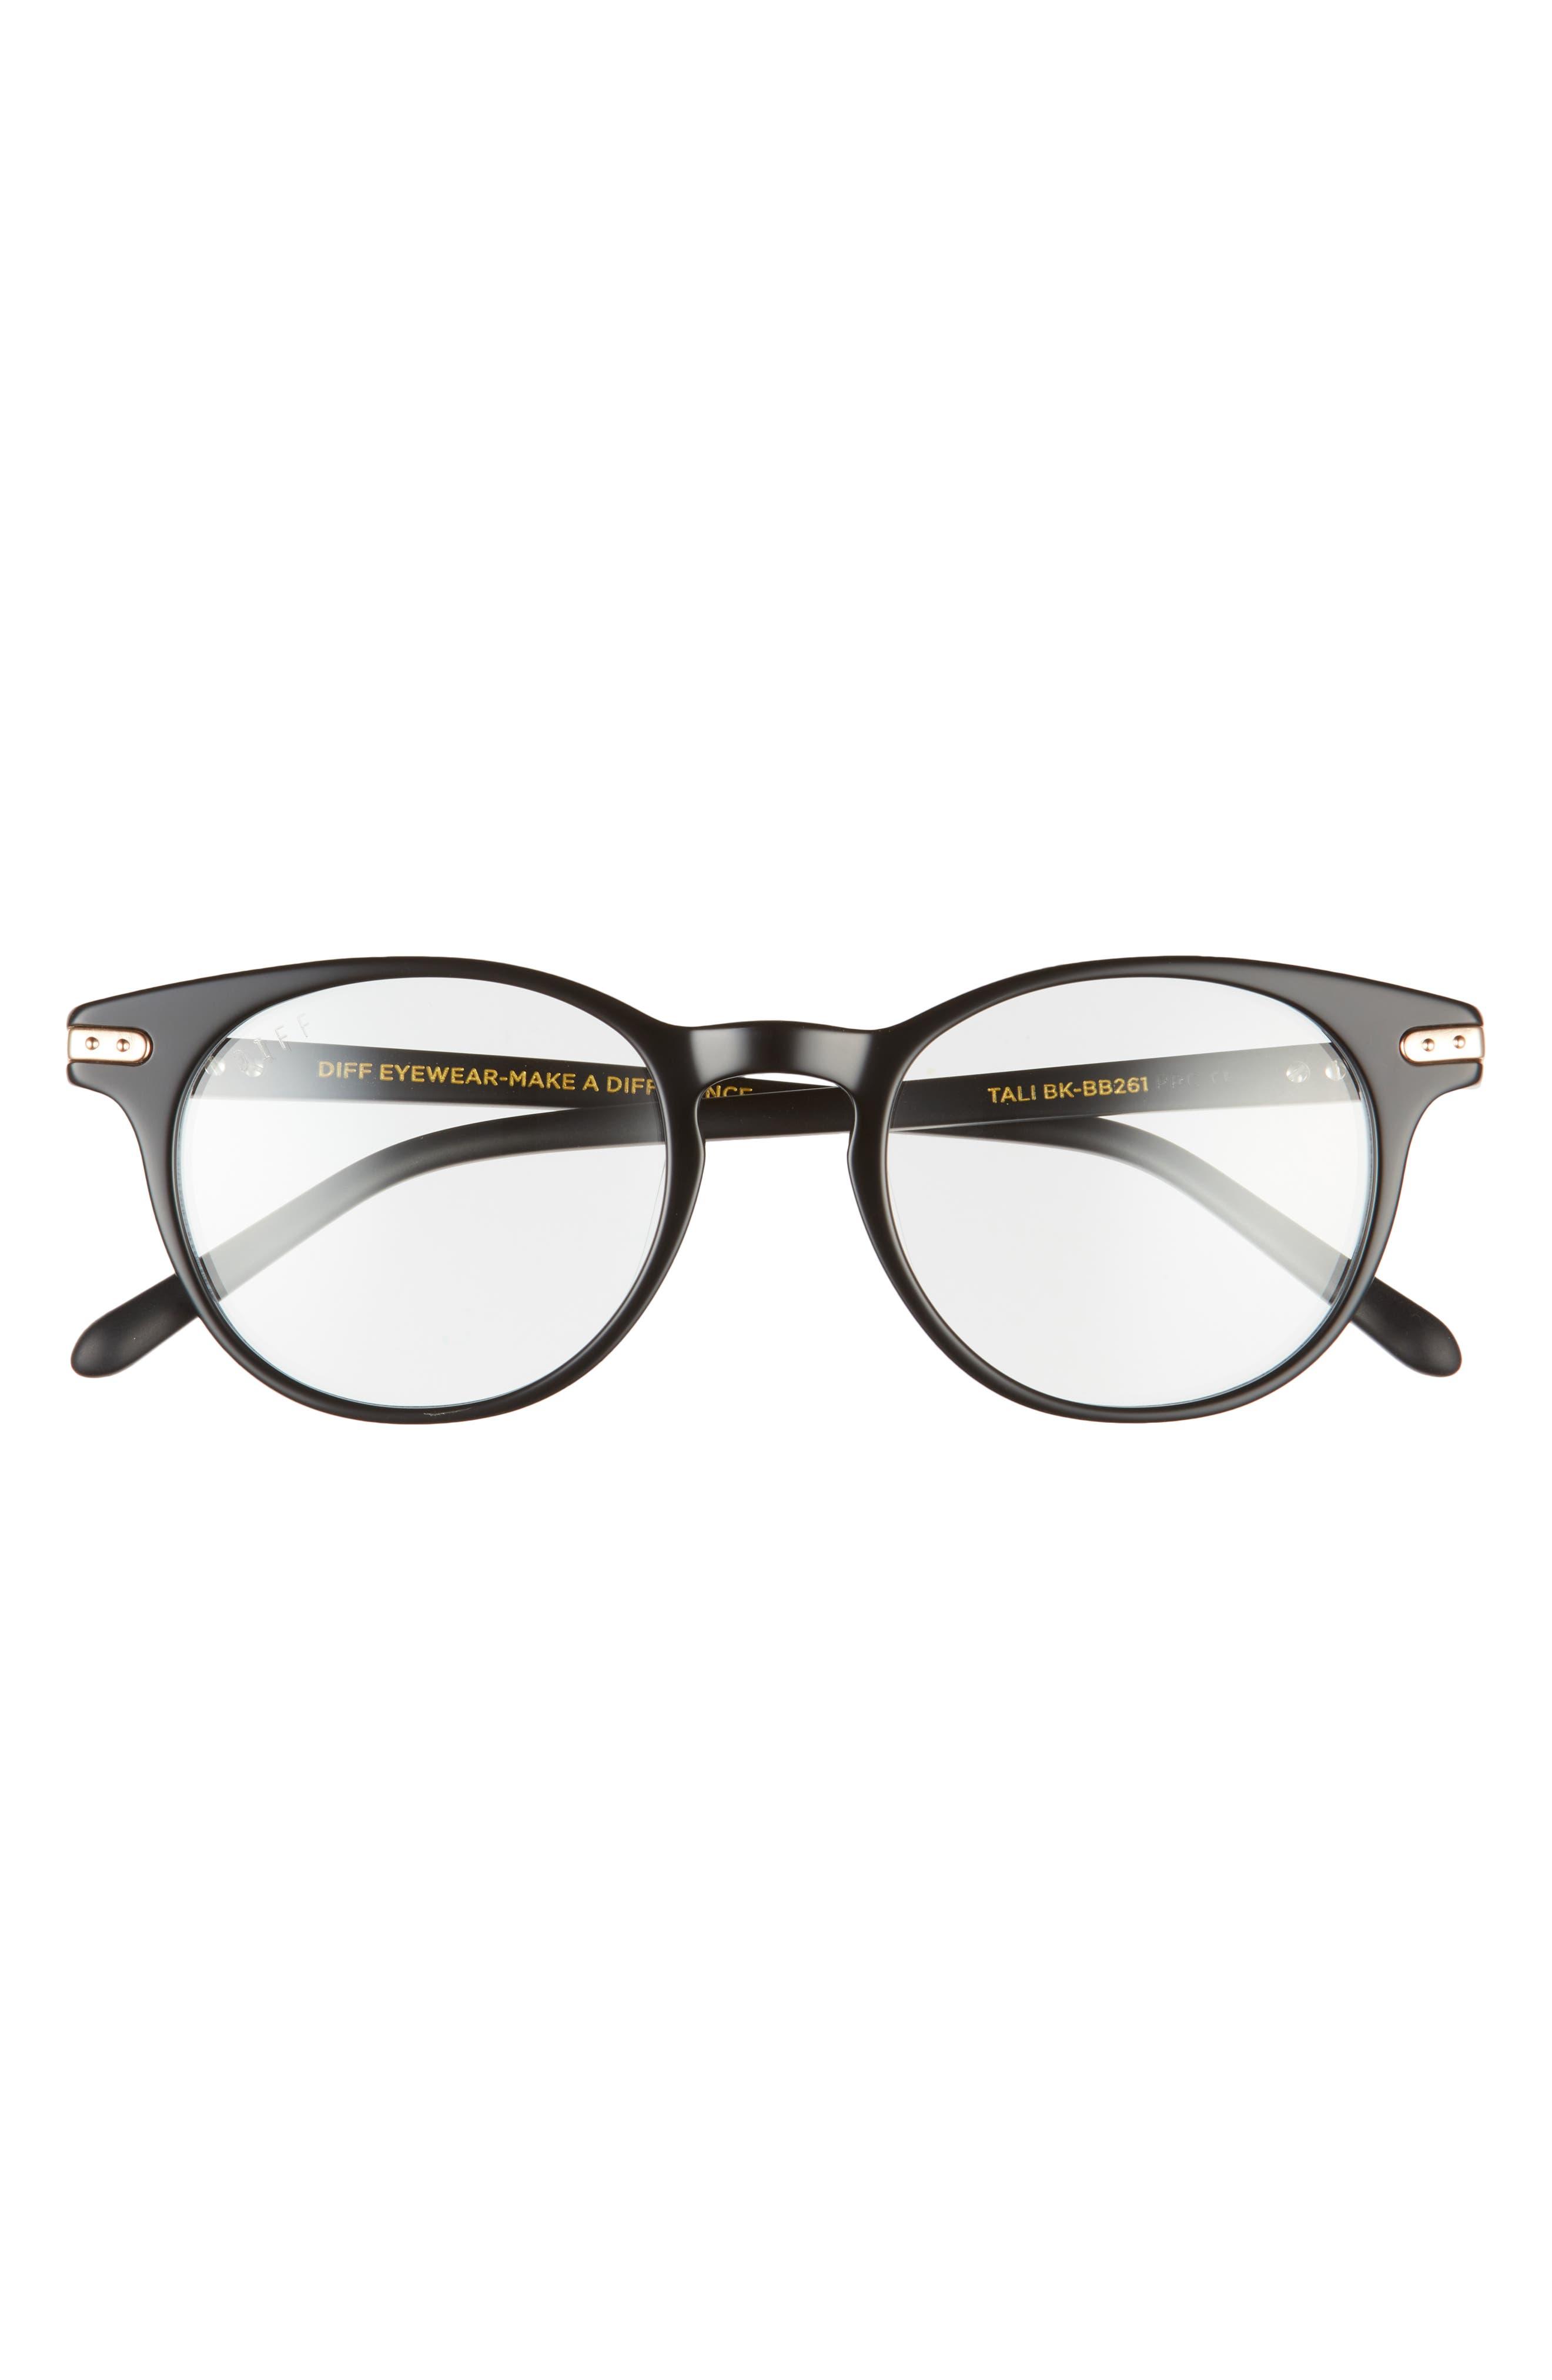 Tali 48mm Round Blue Light Blocking Glasses